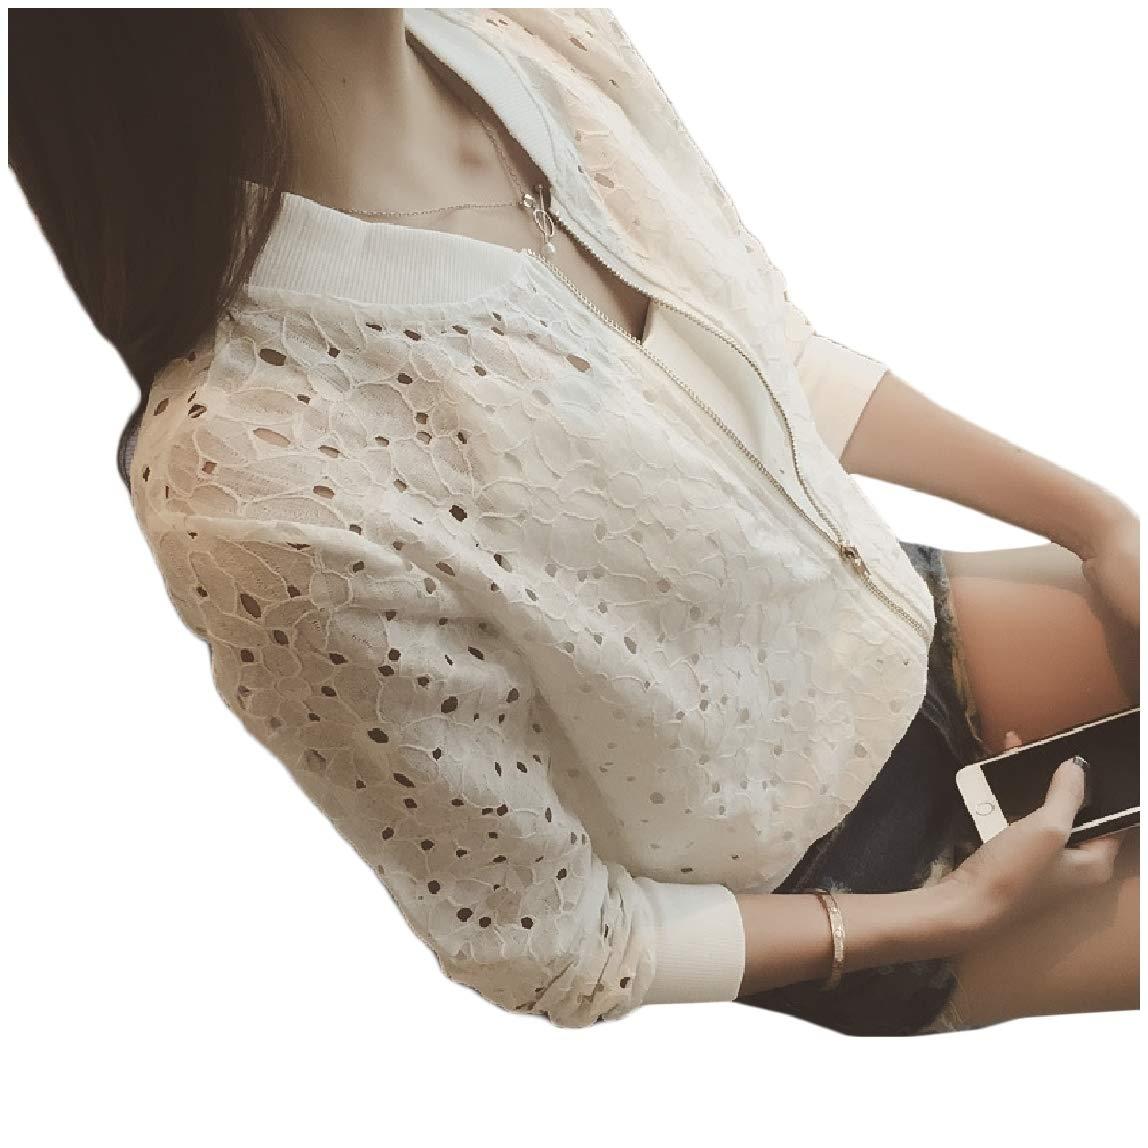 MirrliyWomen Hollow Out Weekend Long-Sleeve Stand Collar Zip Outwear Jacket White S